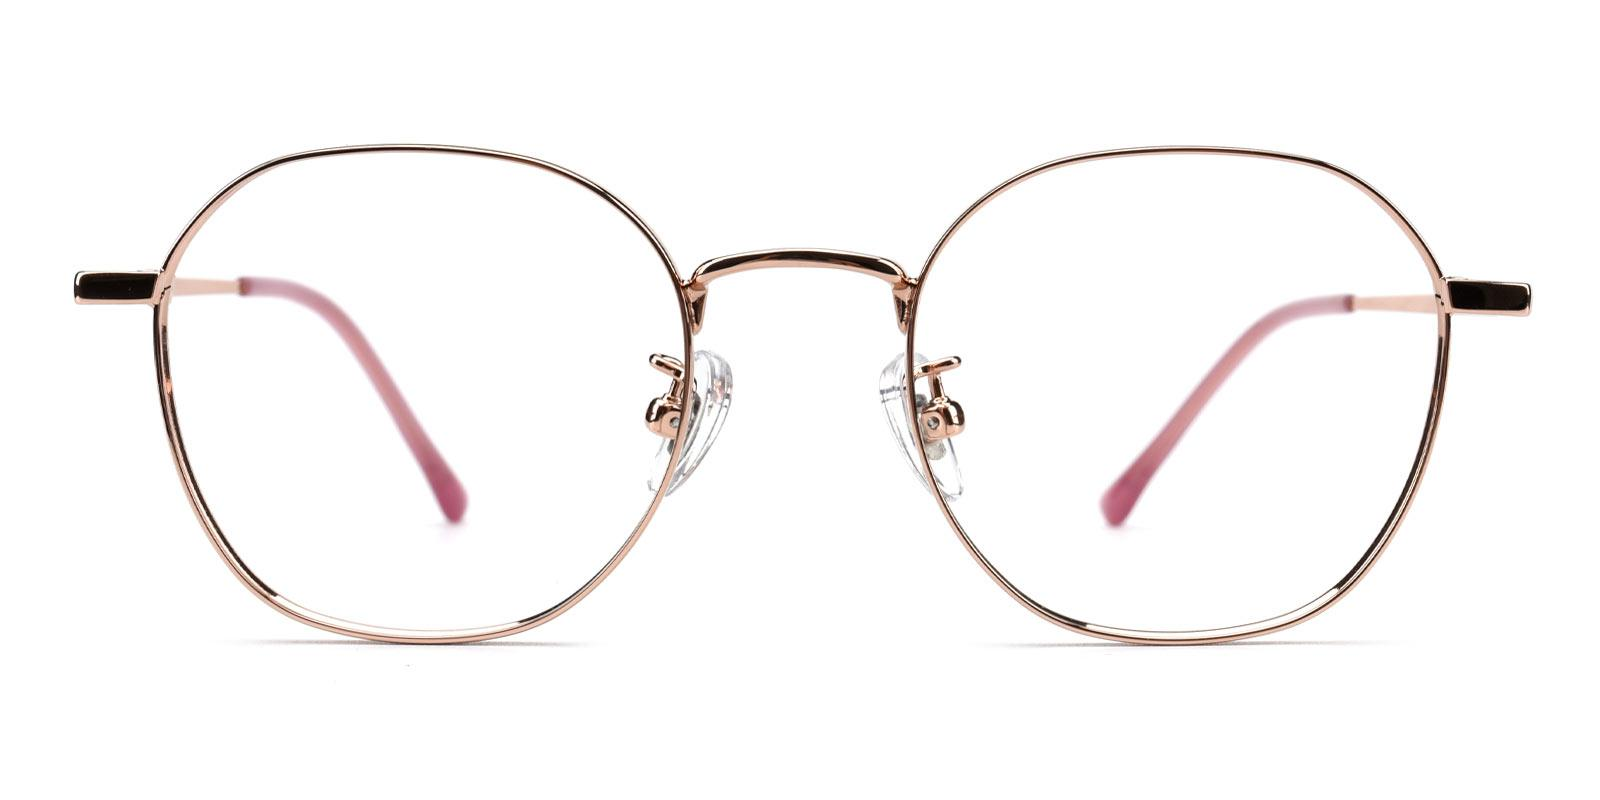 Iron-Pink-Round-Titanium-Eyeglasses-detail